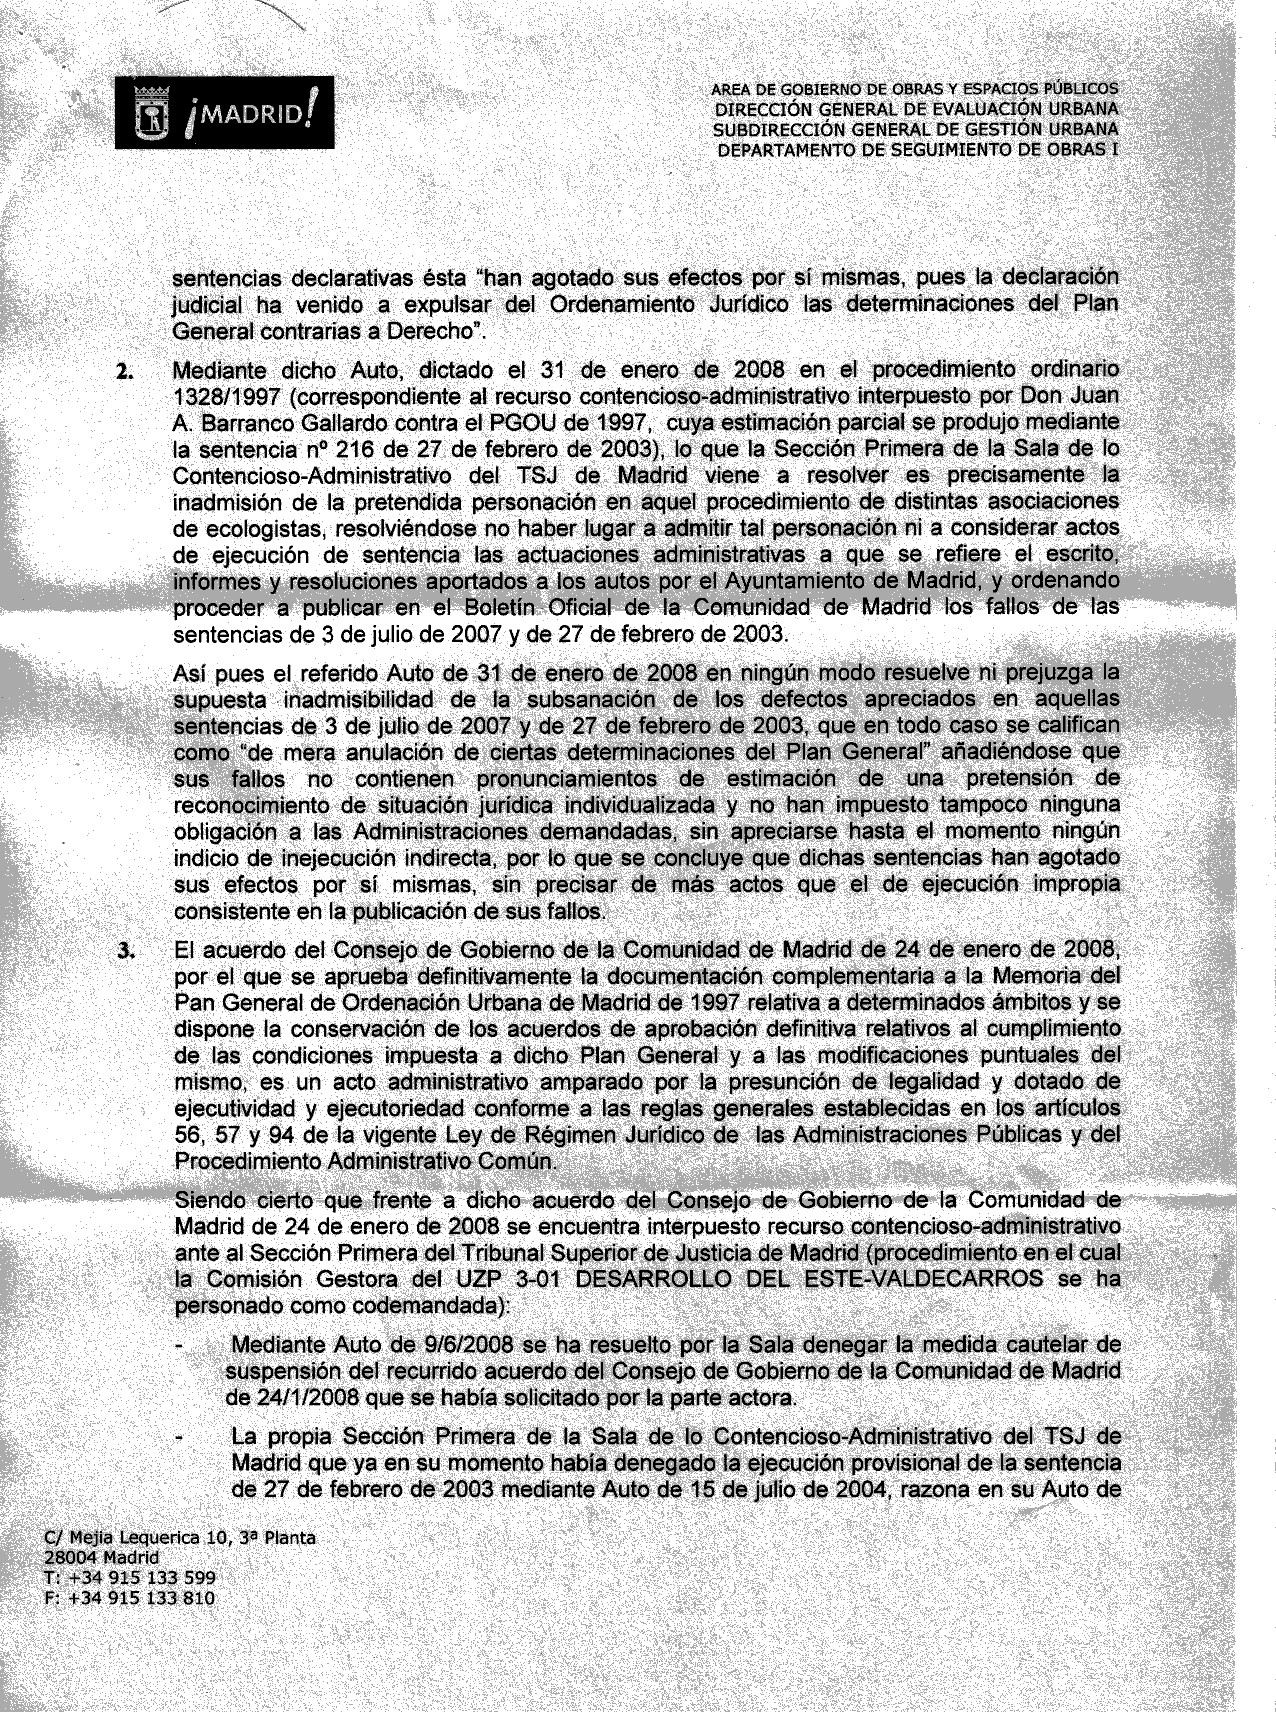 proyecto_Valdecarros-2.jpg